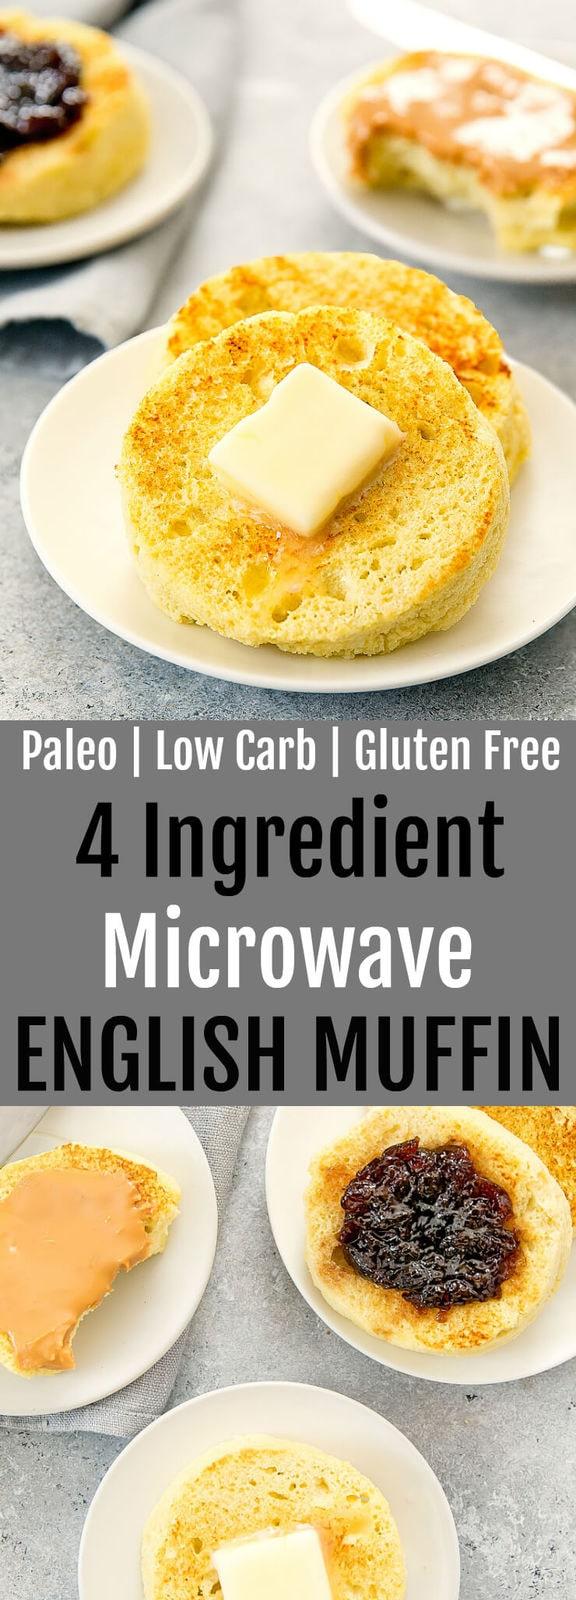 4 ingredient microwave paleo low carb english muffin - kirbie's cravings